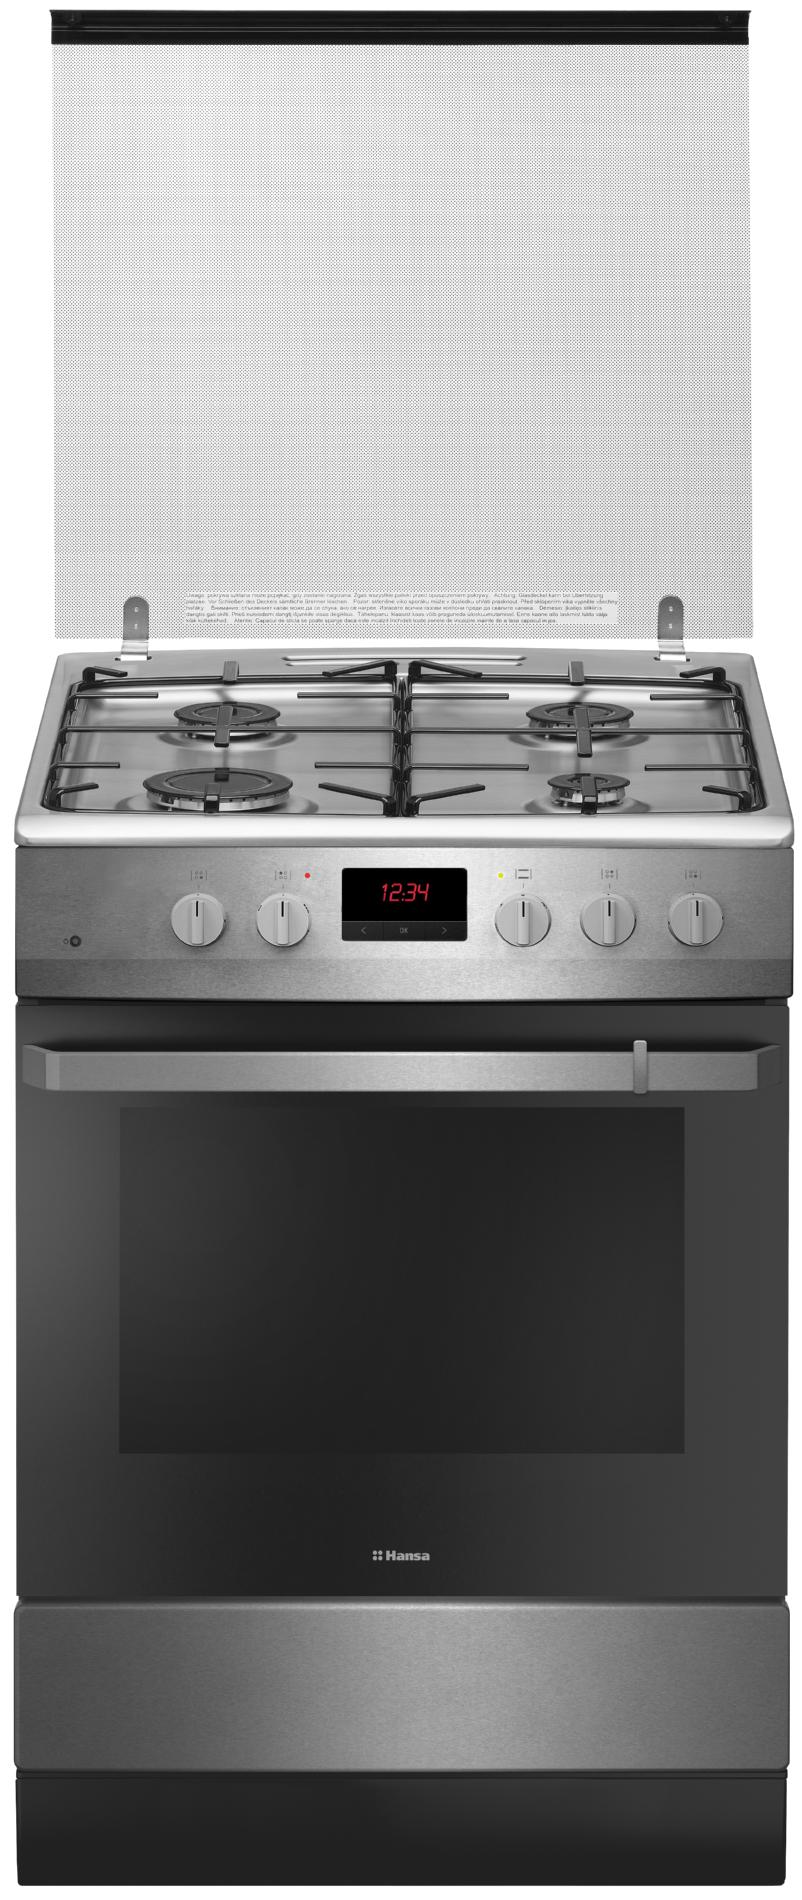 FCGX62290 - Aragaz cu plită cu gaz